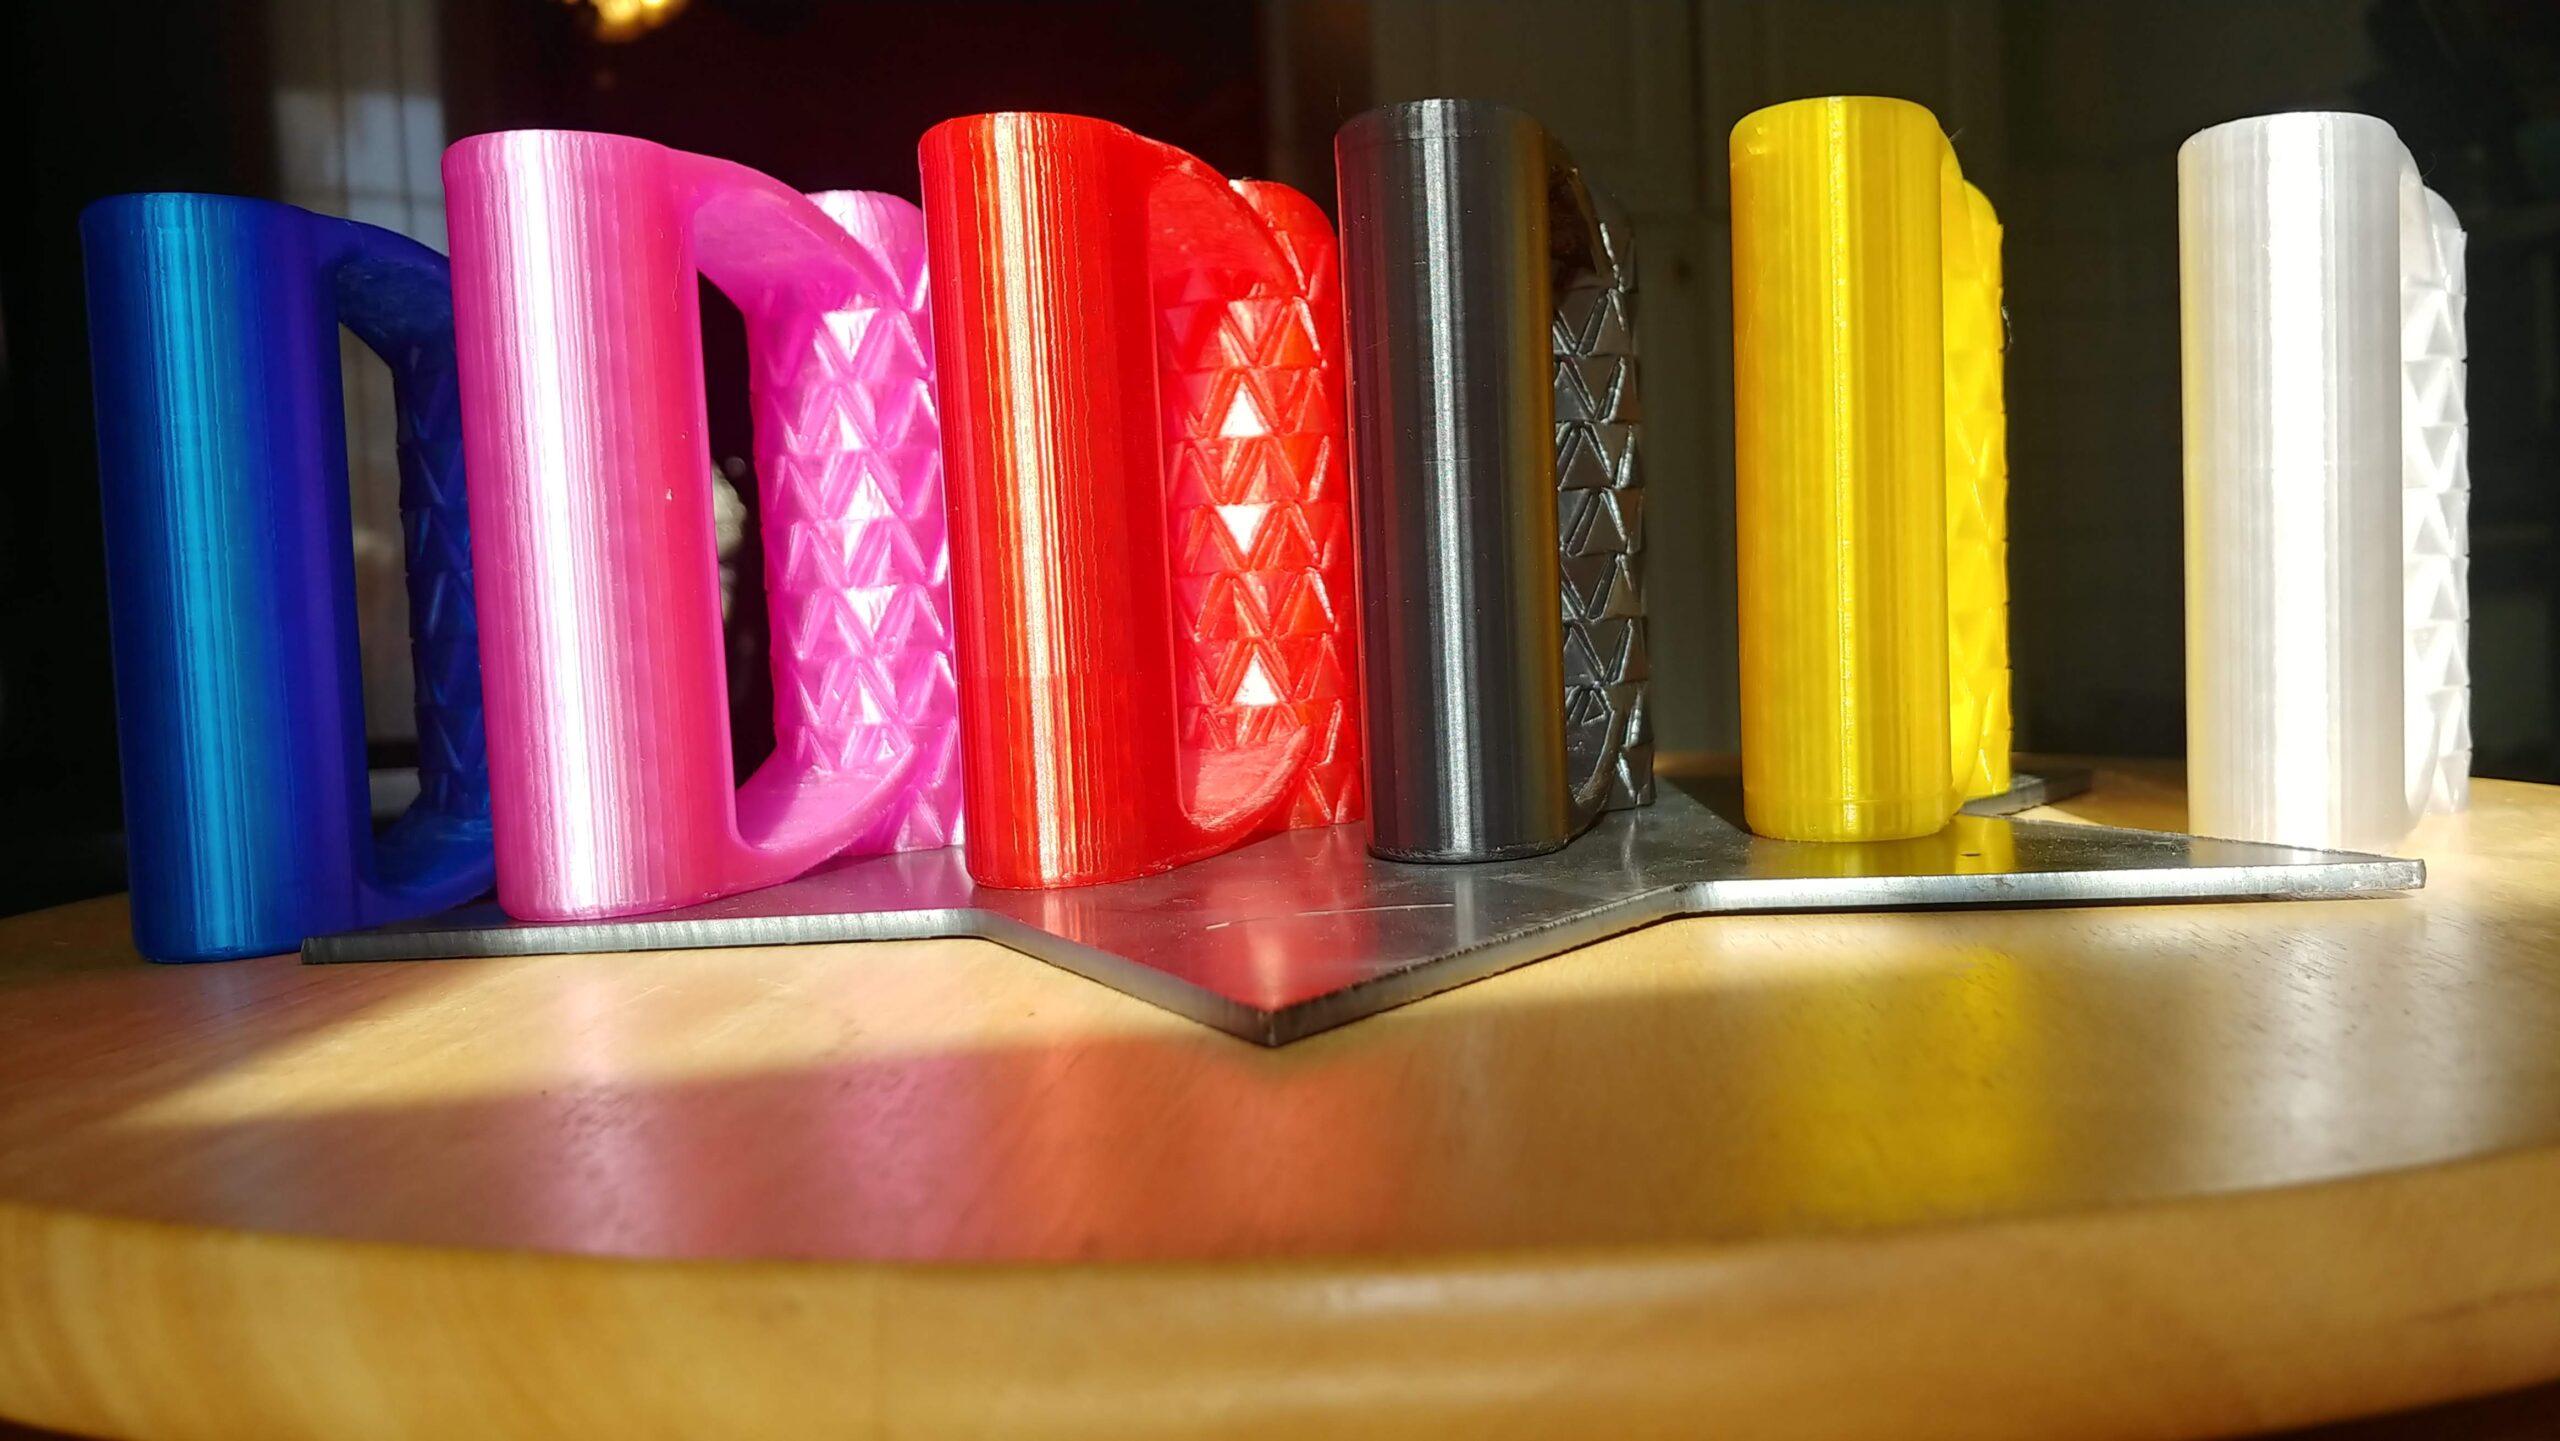 translucent blue PETG, translucent pink PETG, translucent red PETG, black PETG, translucent yellow PETG, clear PETG